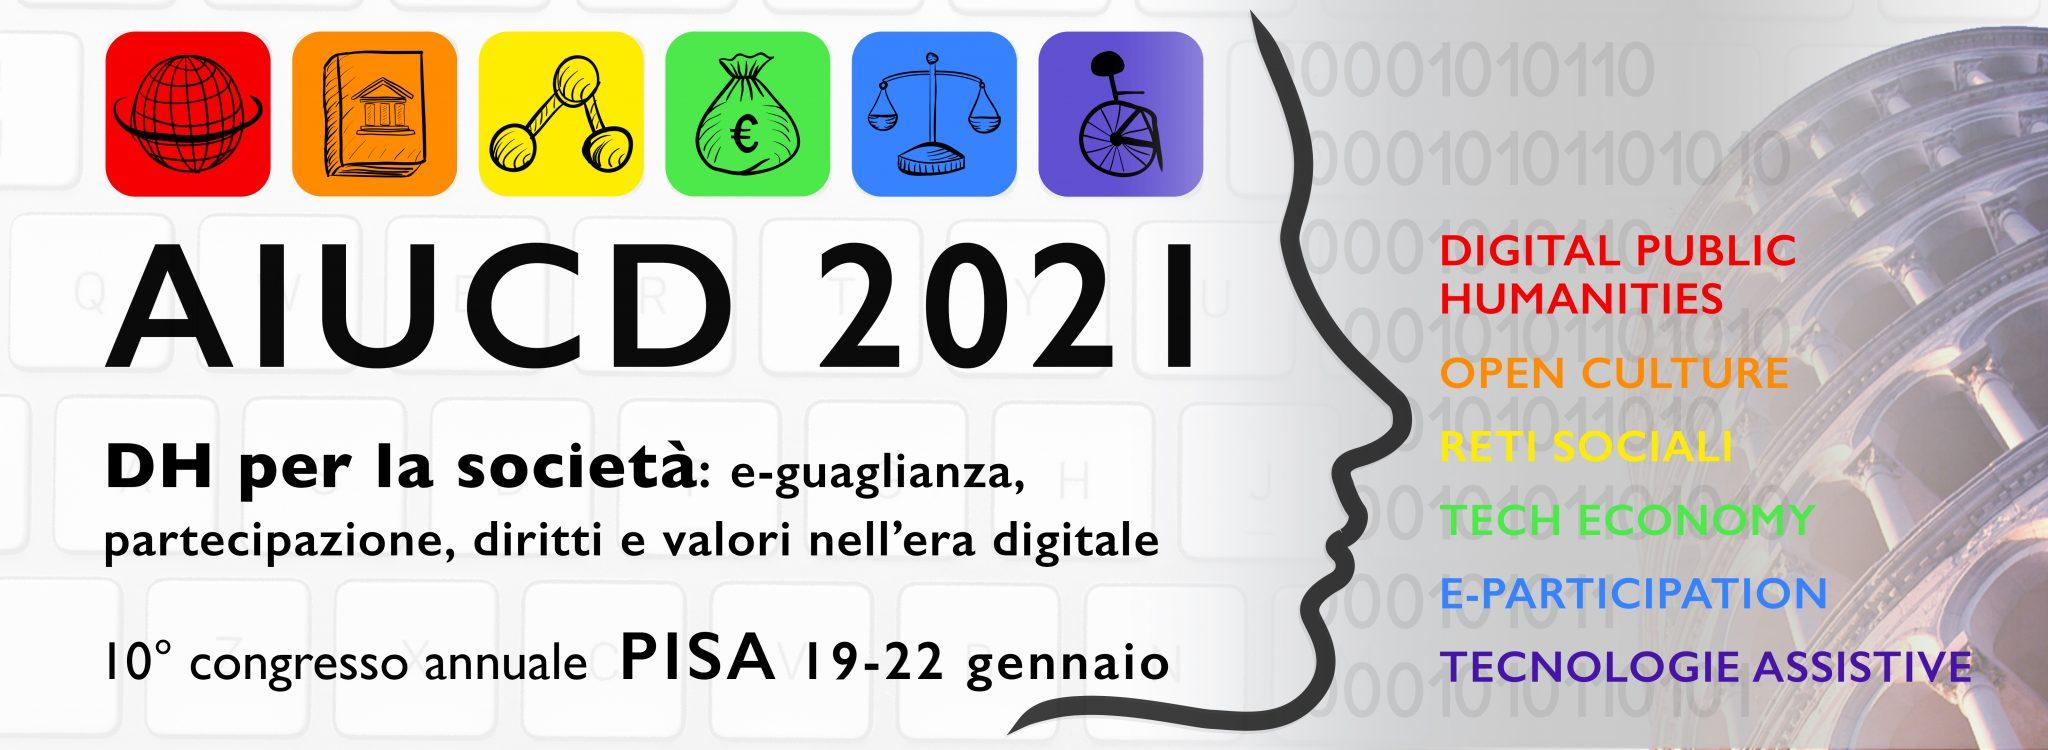 Convegno AIUCD 2021